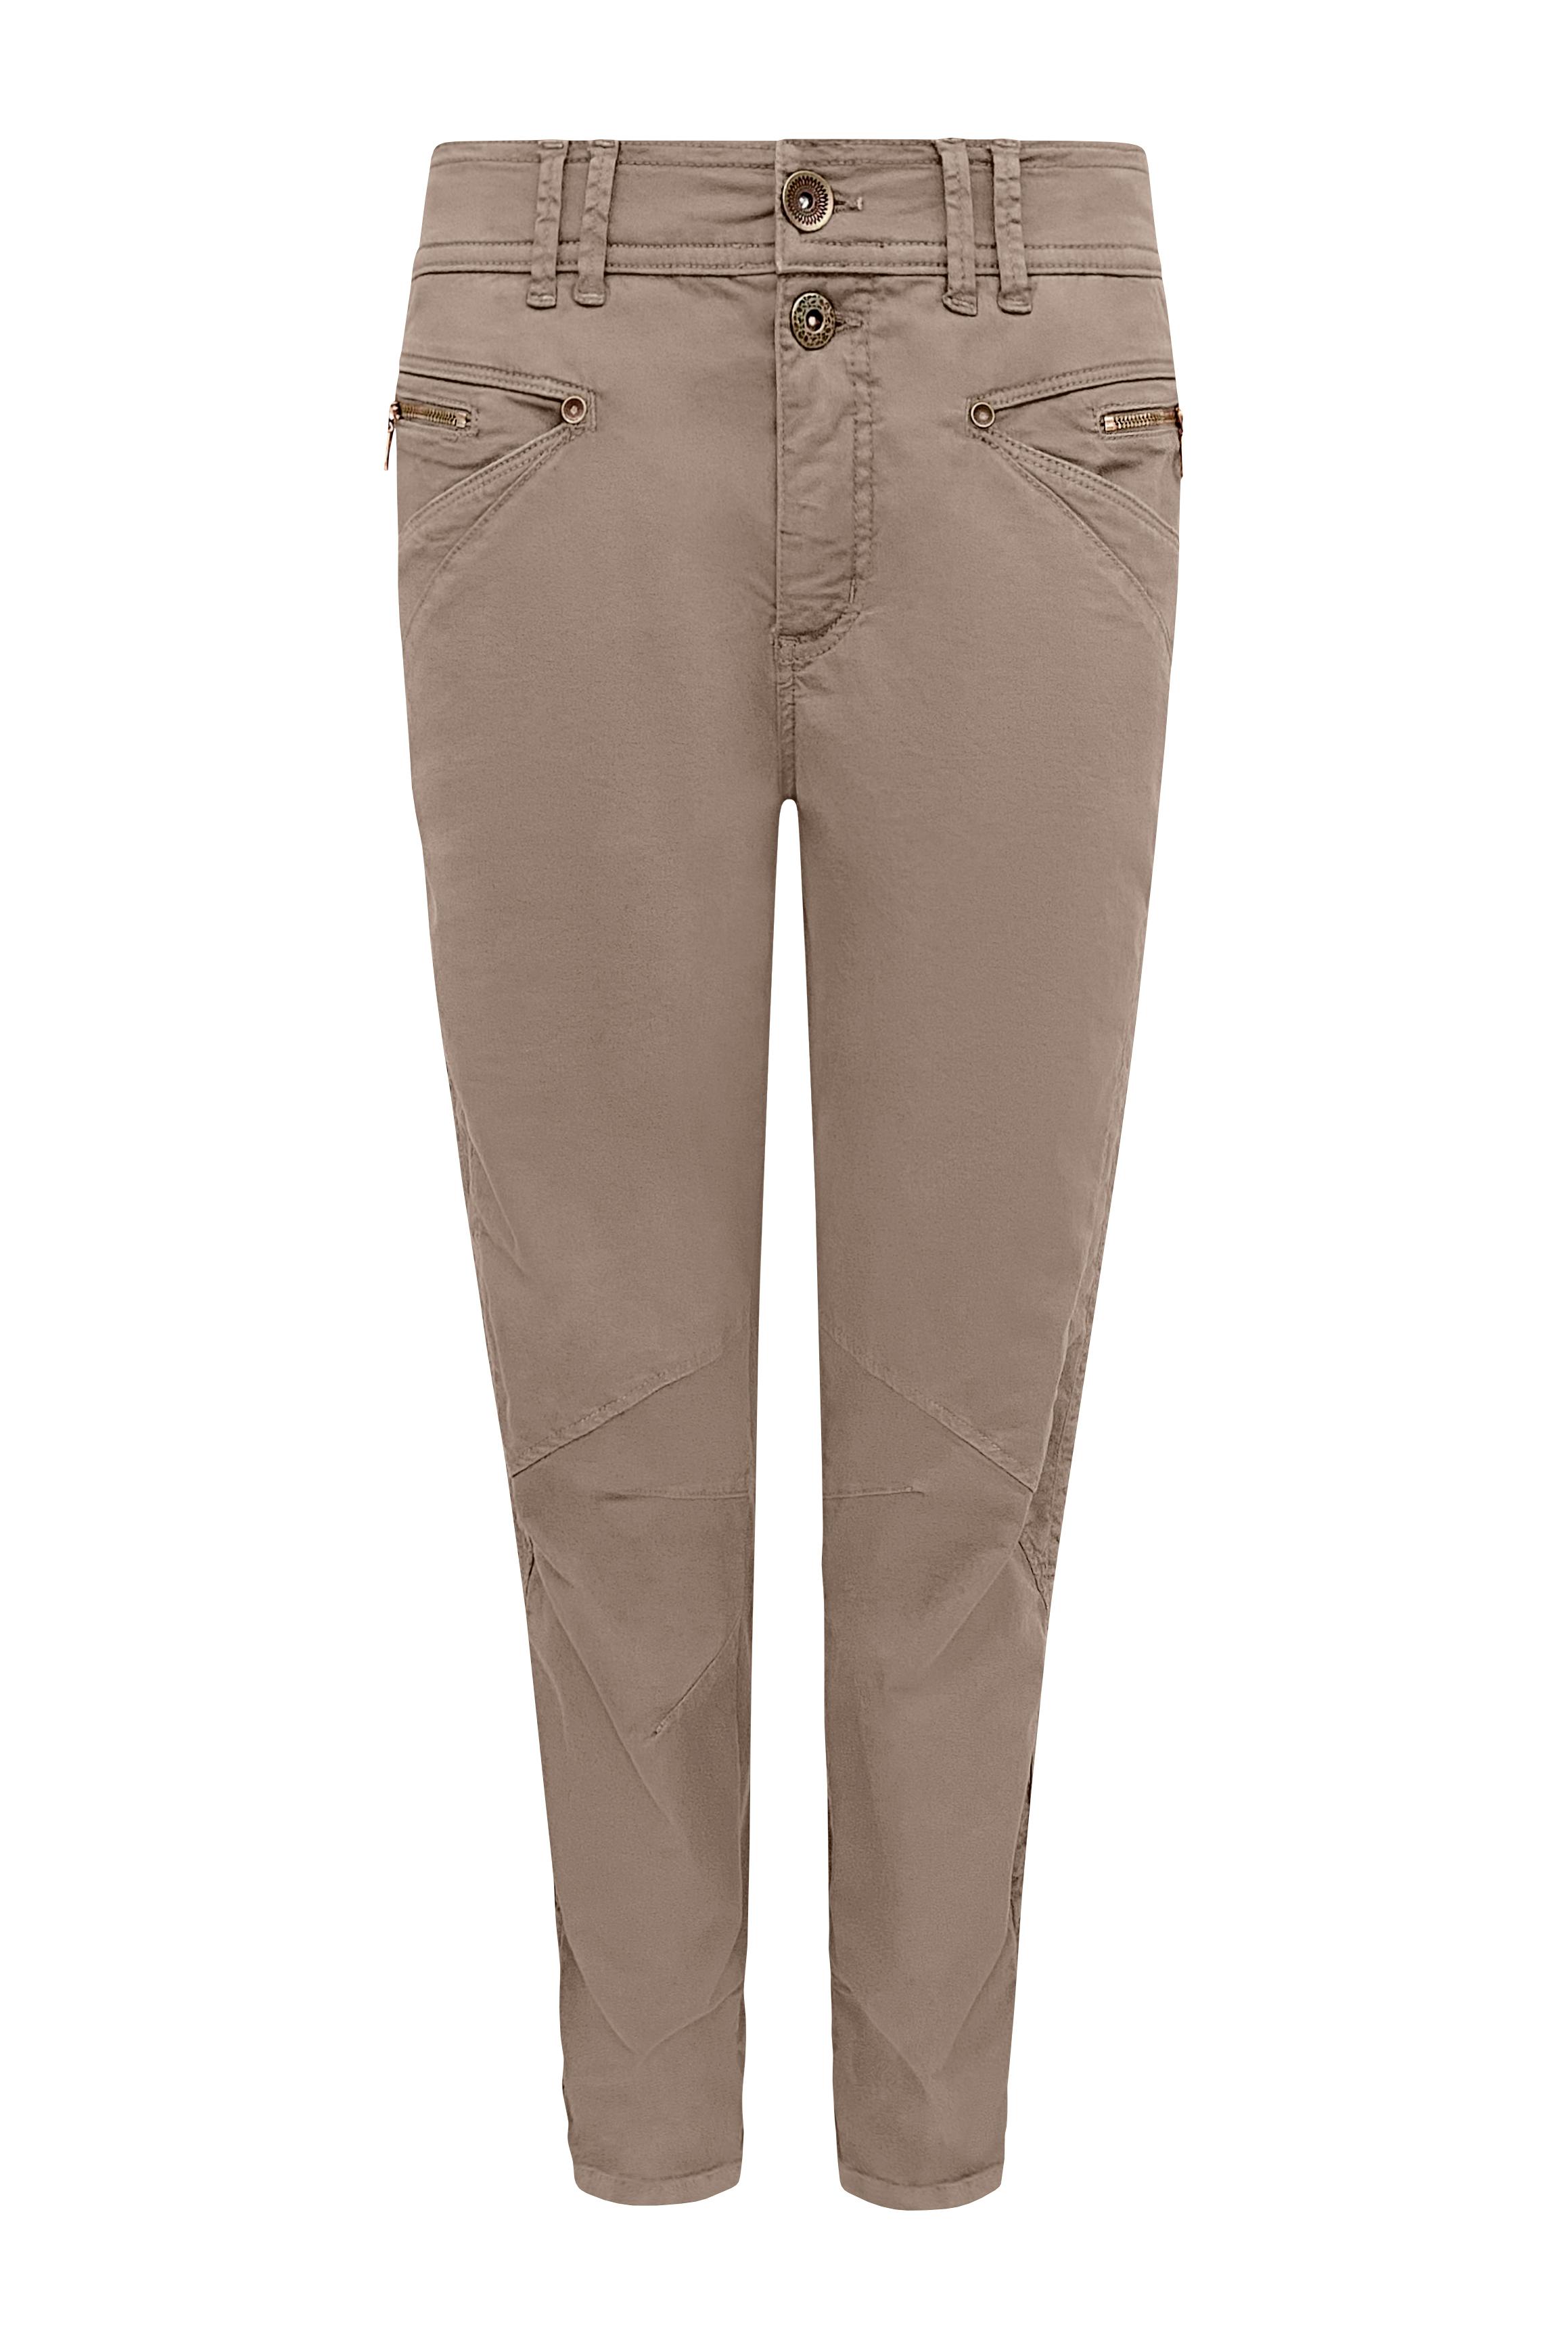 2-Biz Sabera bukser